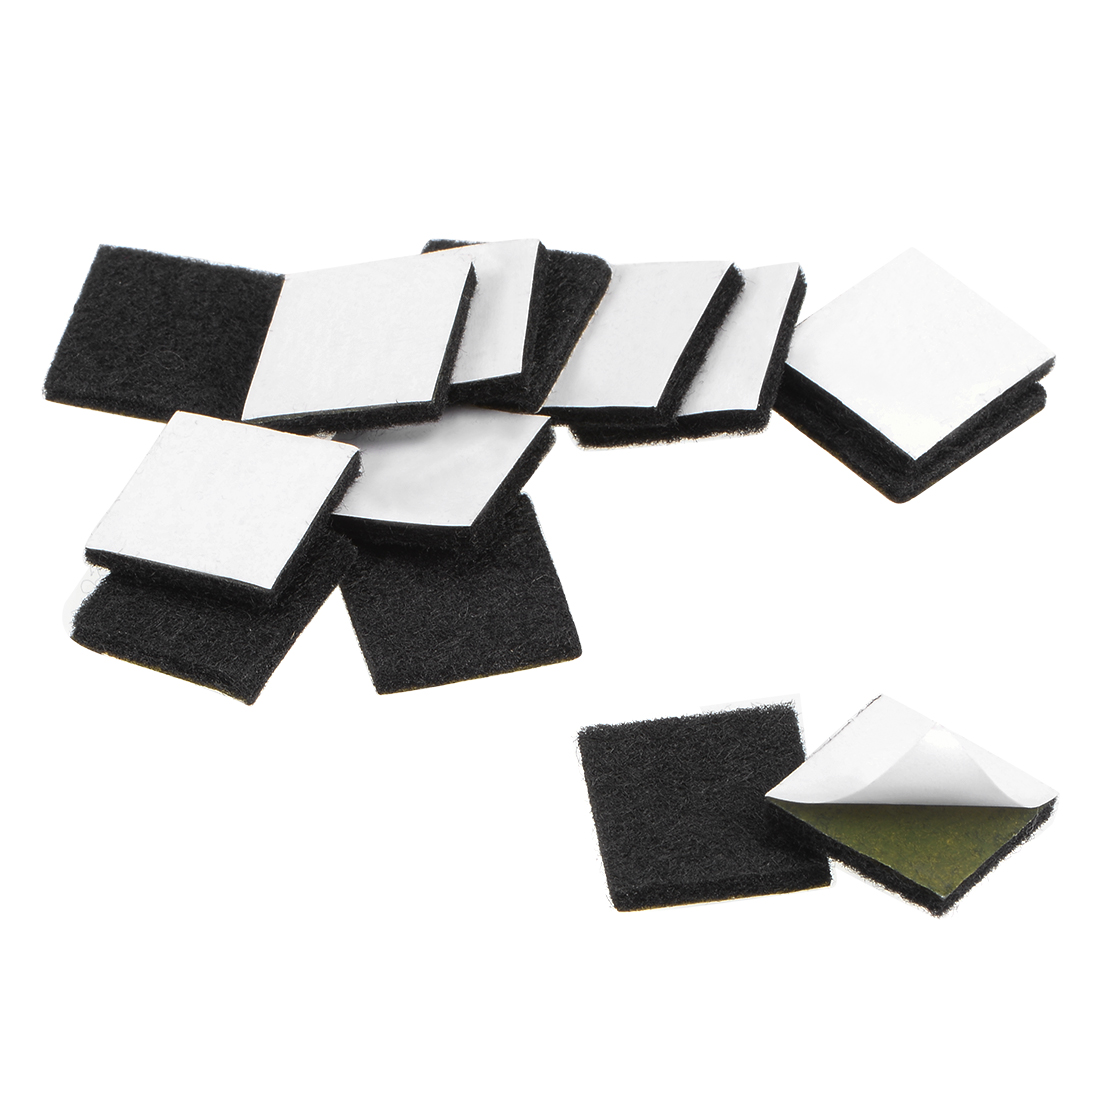 Furniture Pads Adhesive Felt Pads 20mm x 20mm Square 3mm Thick Black 36Pcs